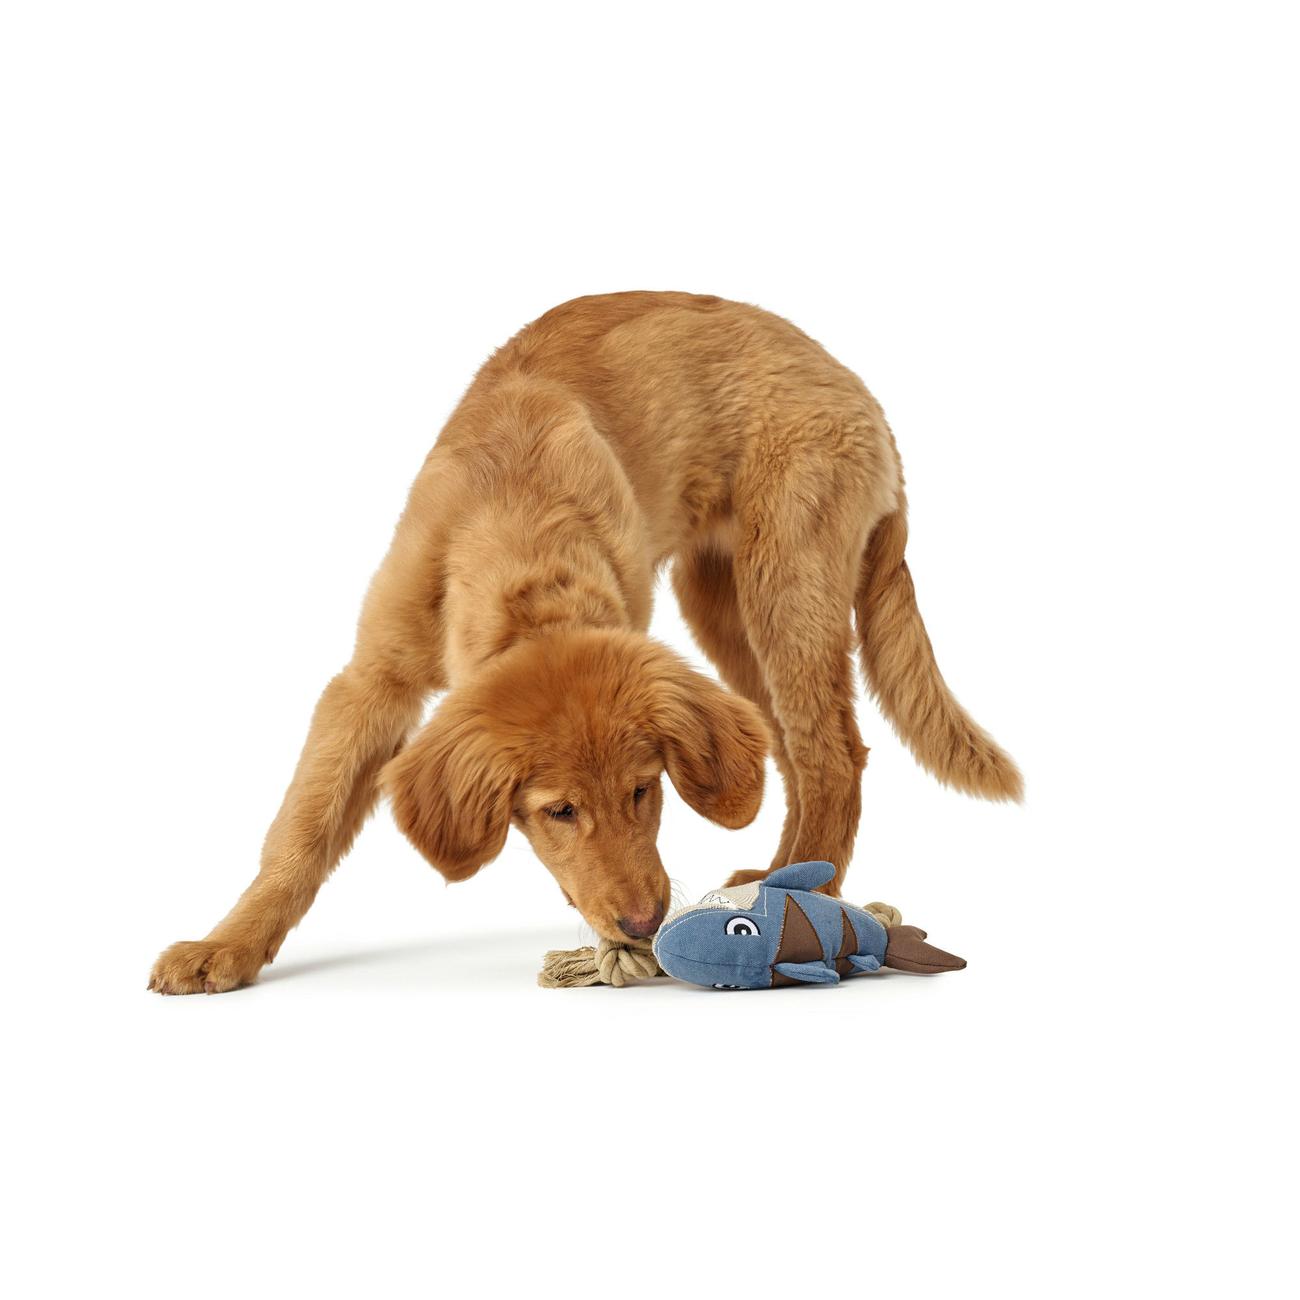 Hunter Hundespielzeug Canvas Sansibar Rantum 65660, Bild 3